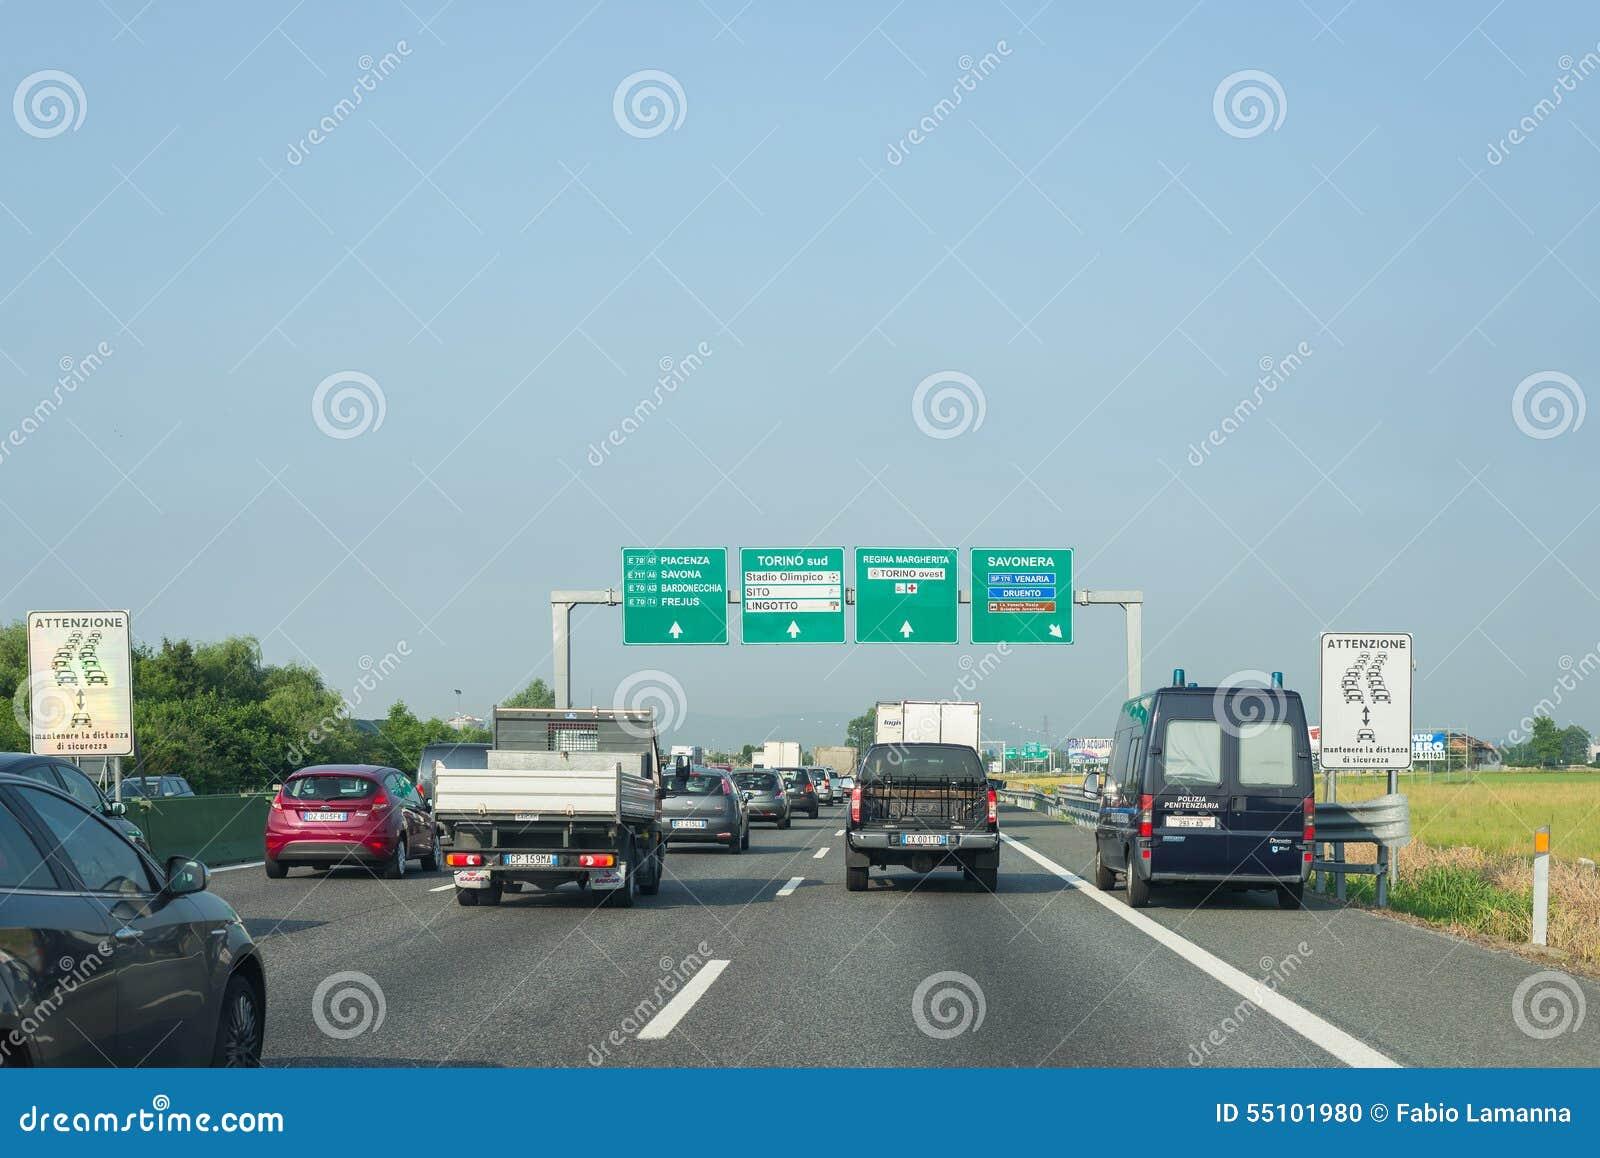 Traffic jam on italian highway